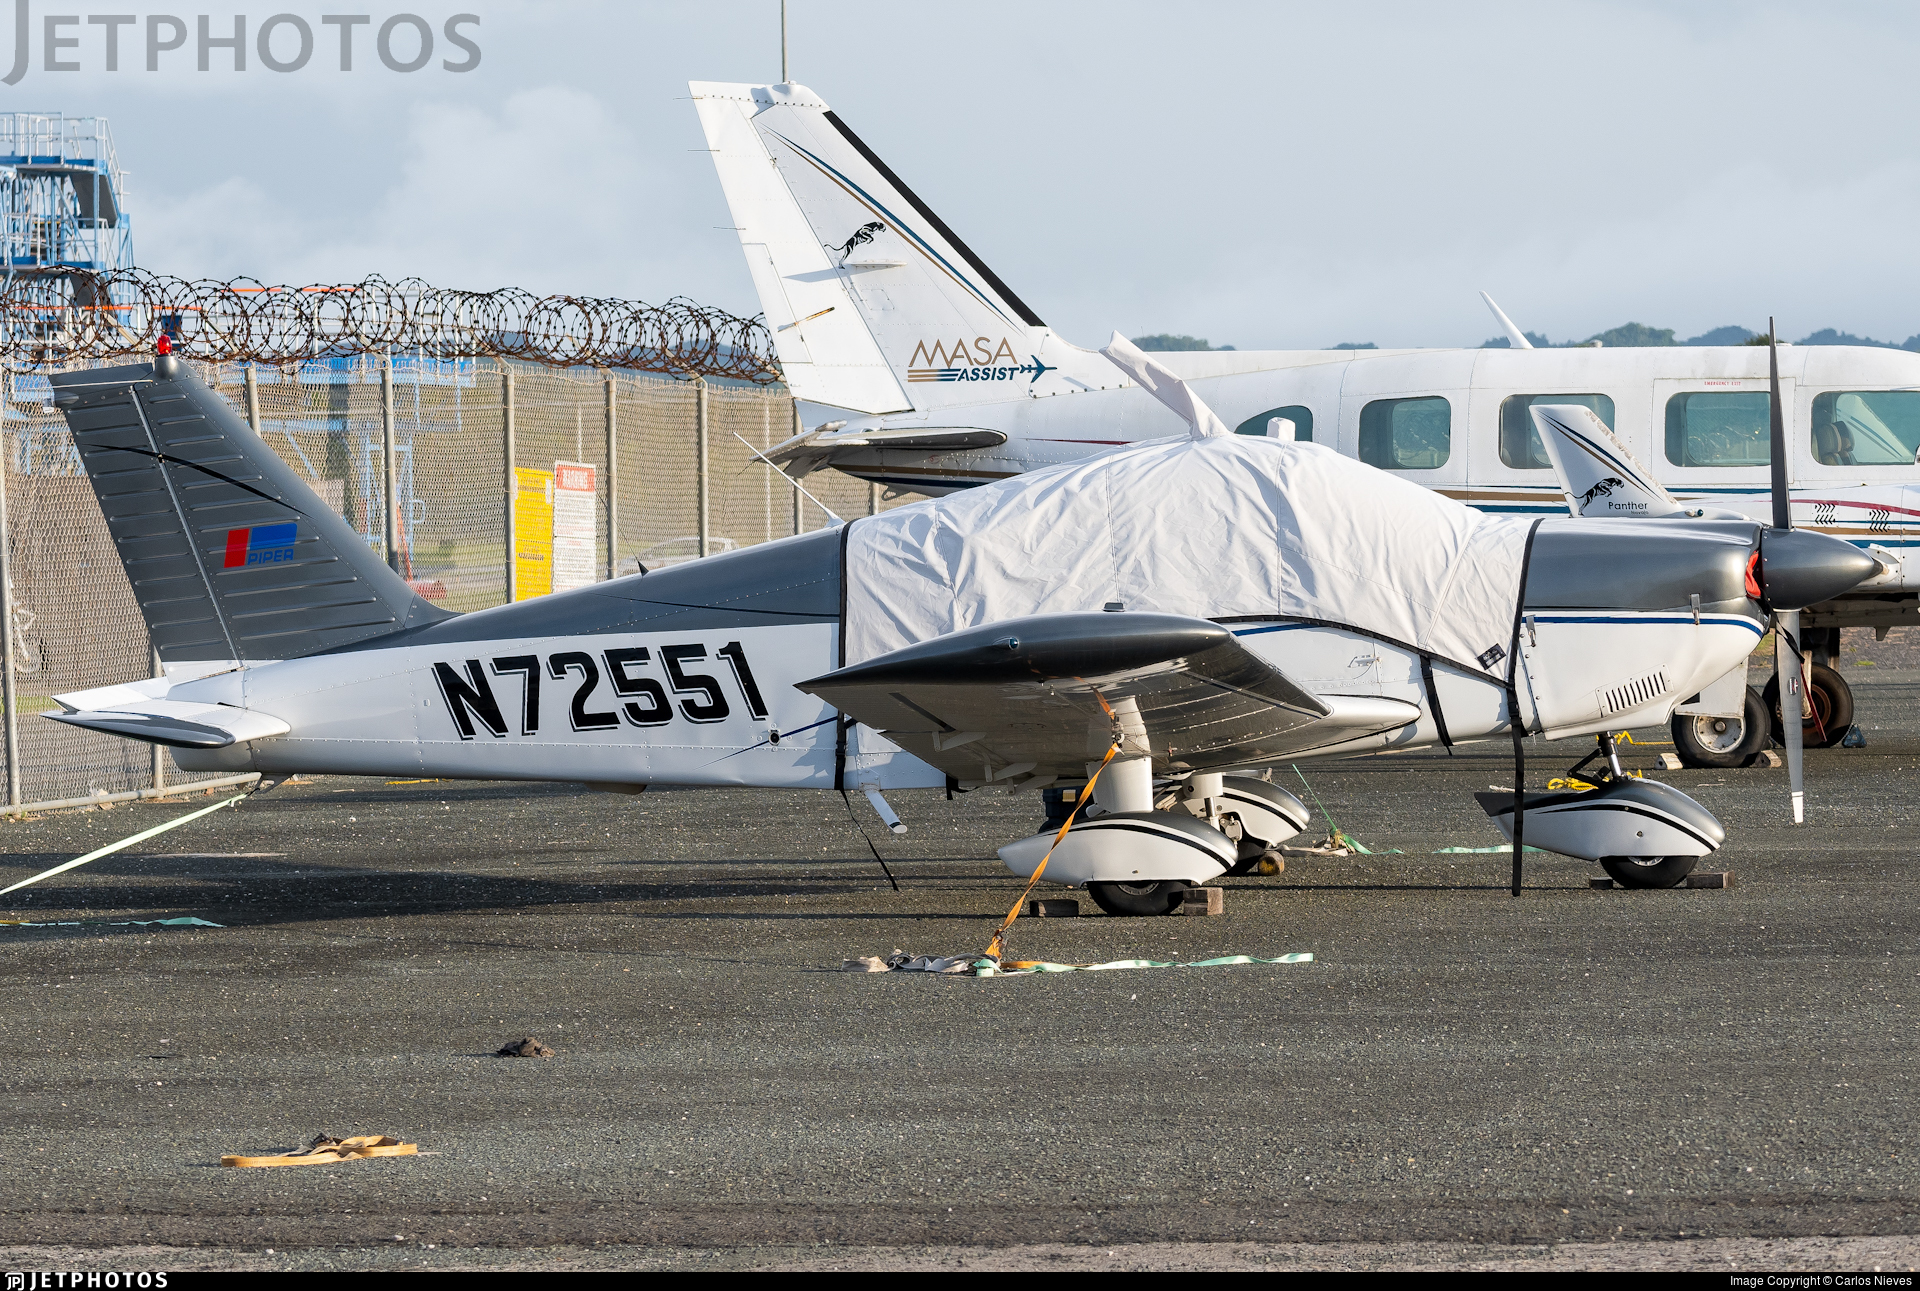 N72551 - Piper PA-28-235 Cherokee B - Private